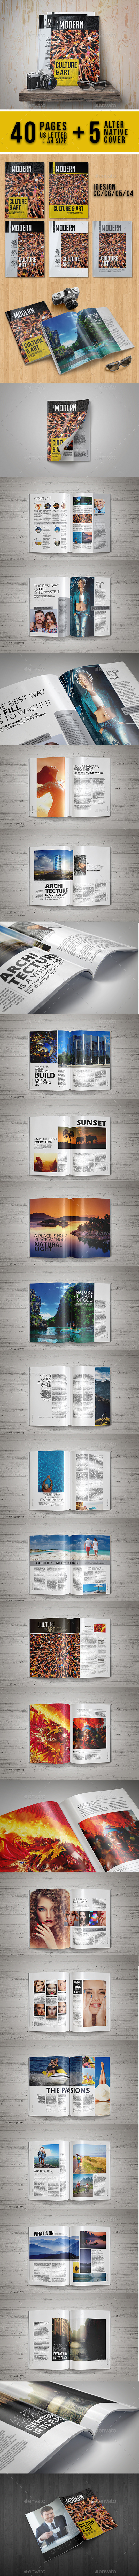 Modern Magazine Template 40 Page - Magazines Print Templates